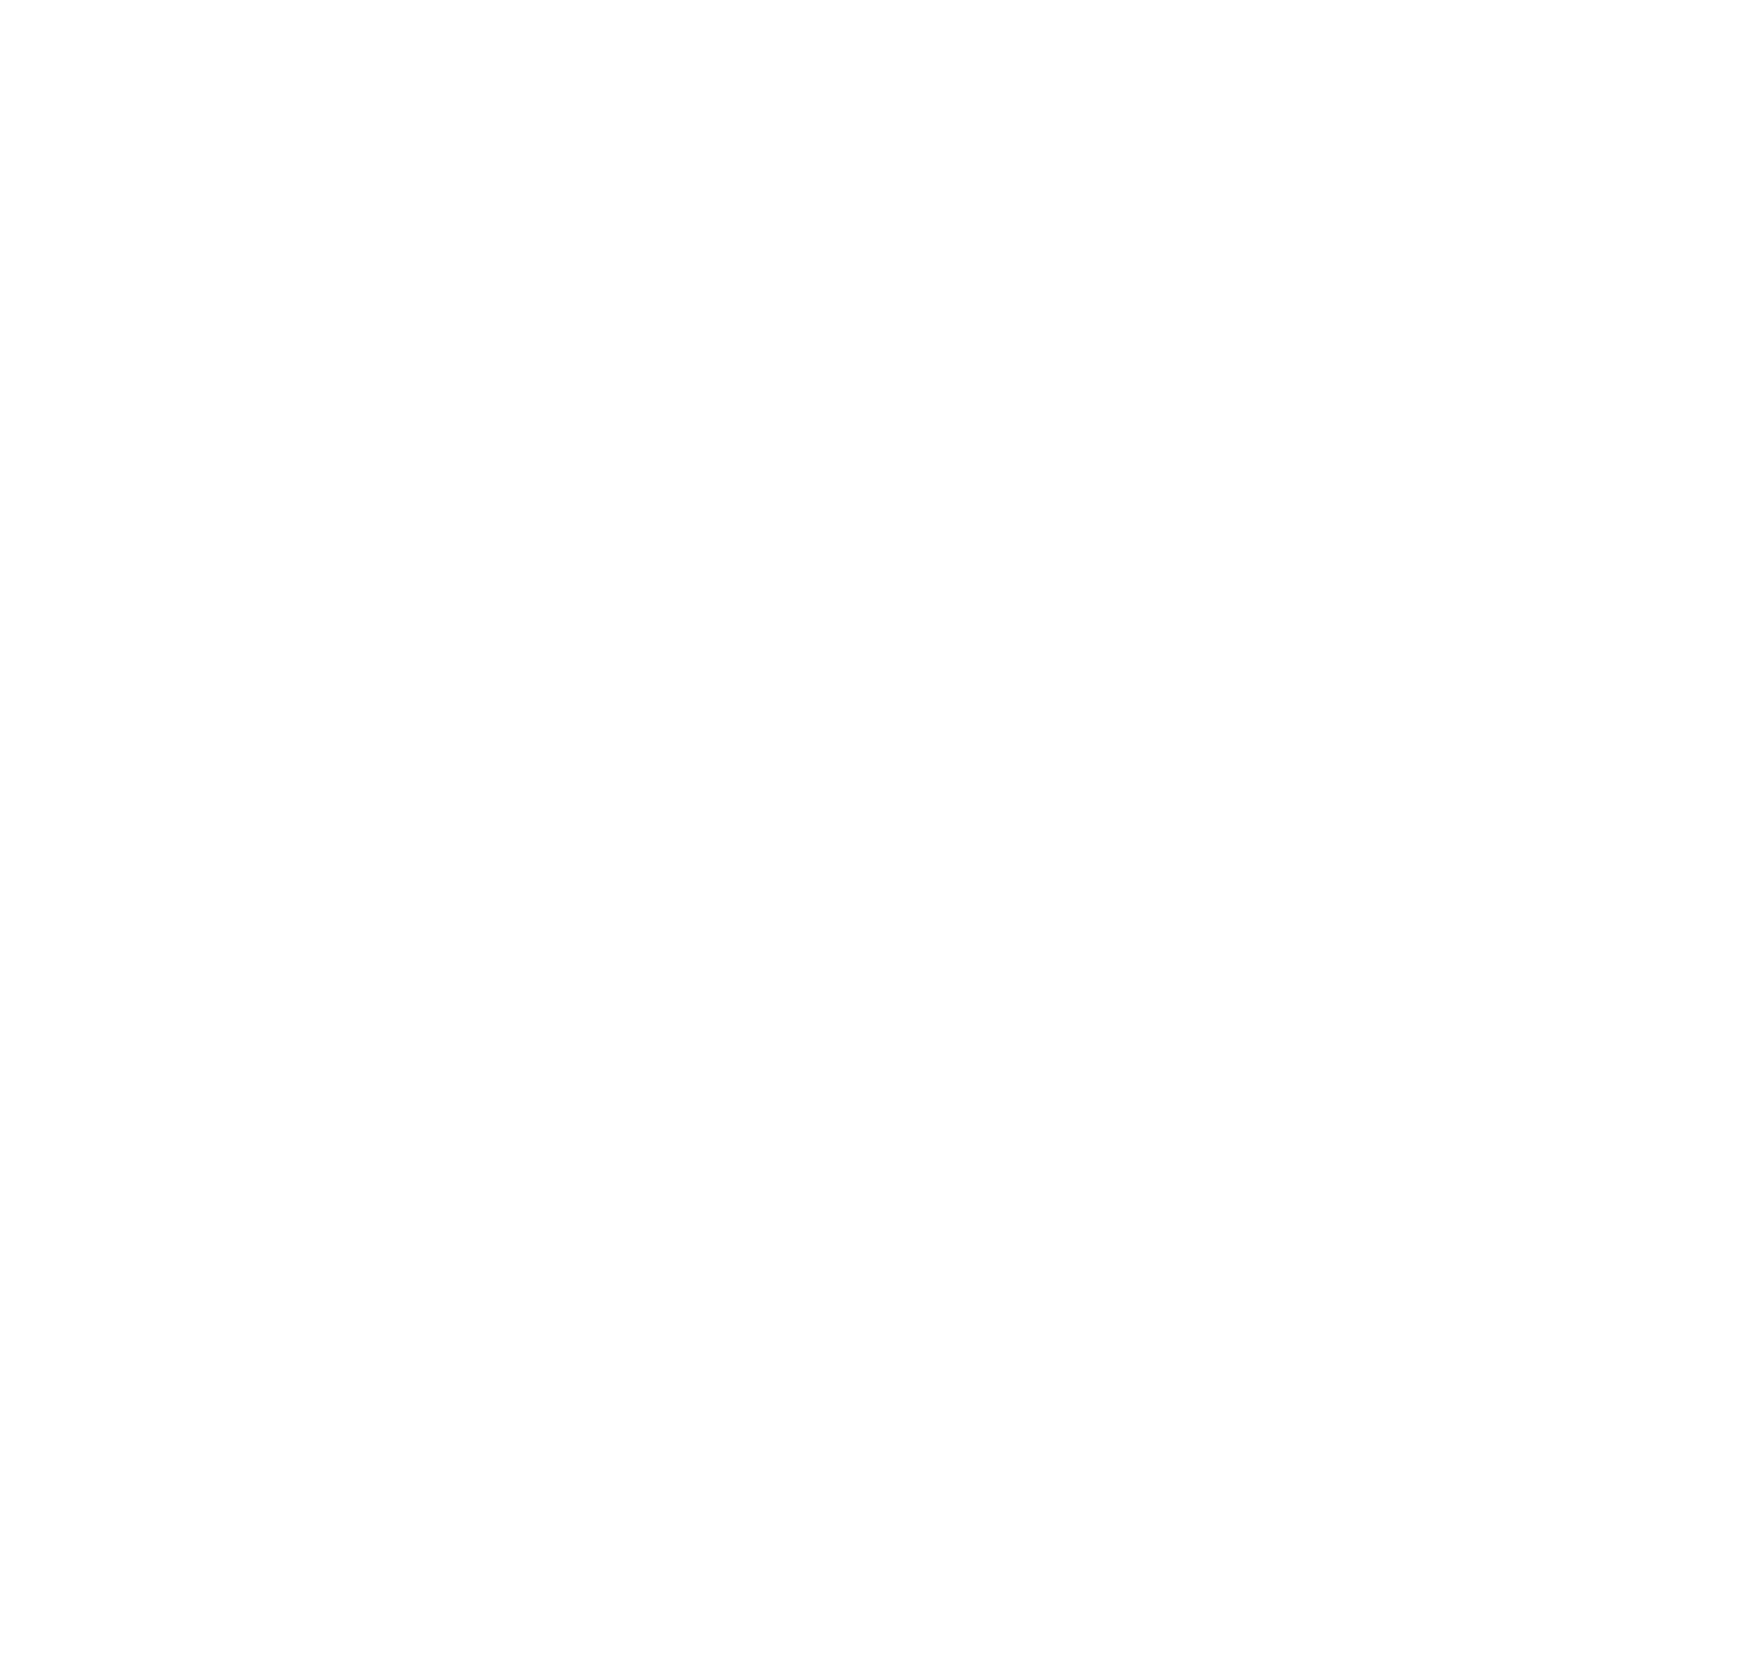 Communication_Area_logo_png (1).png